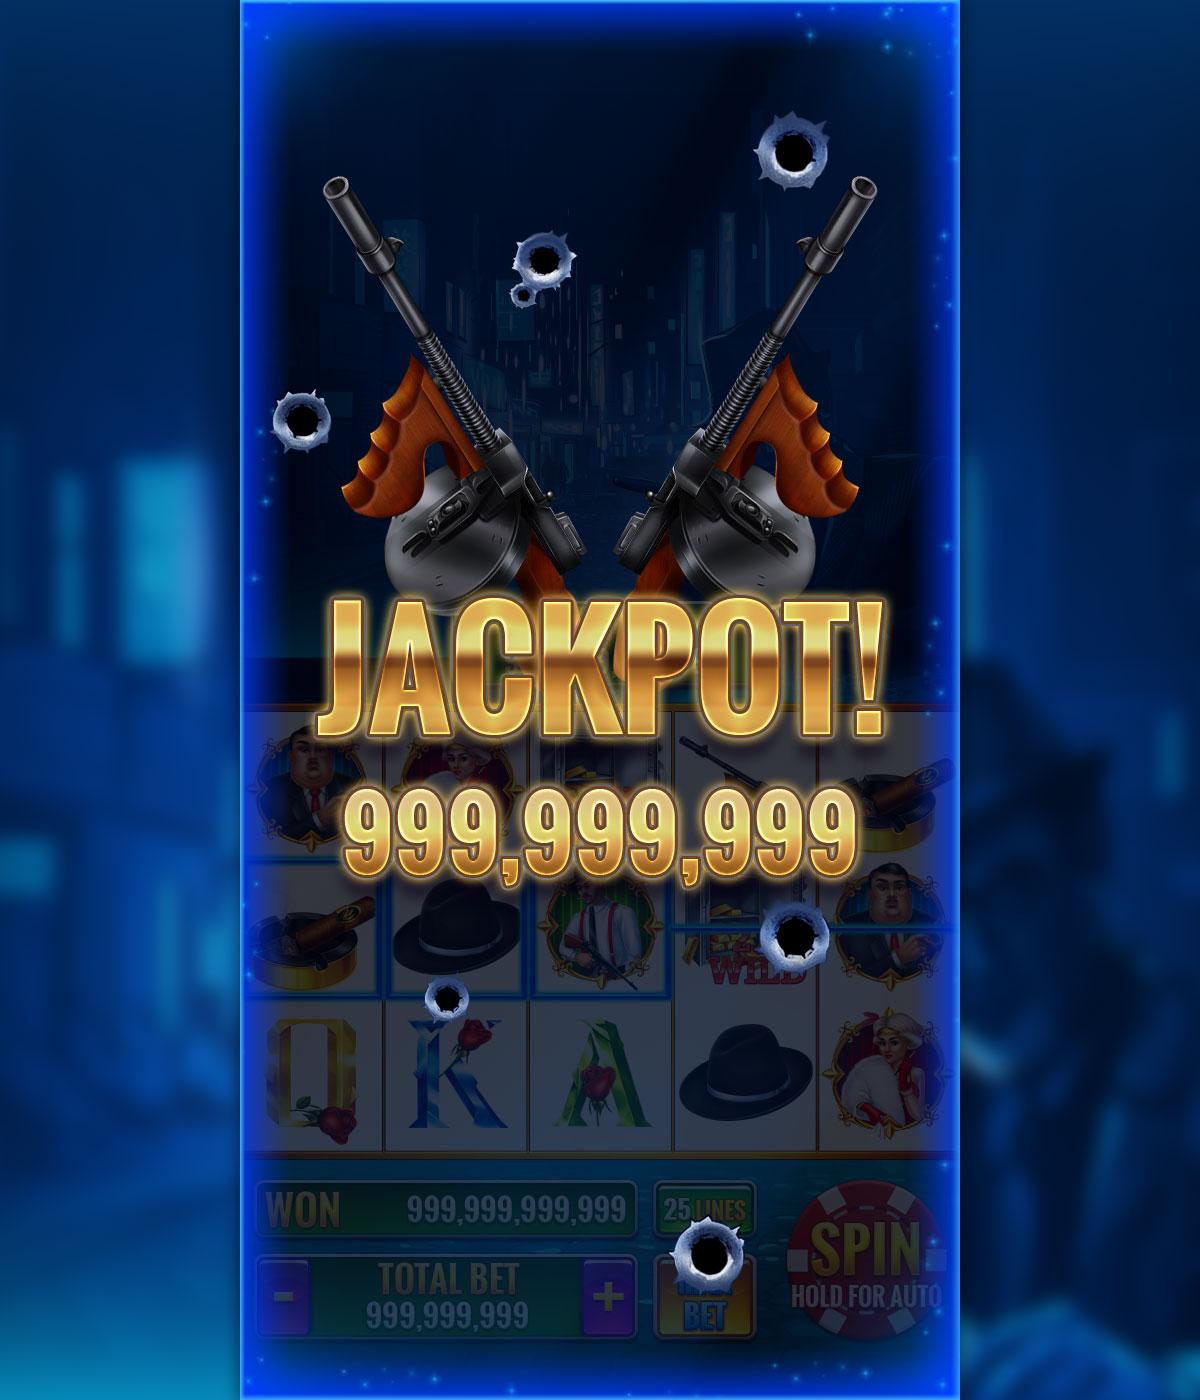 lucky_mafia_blog_jackpot